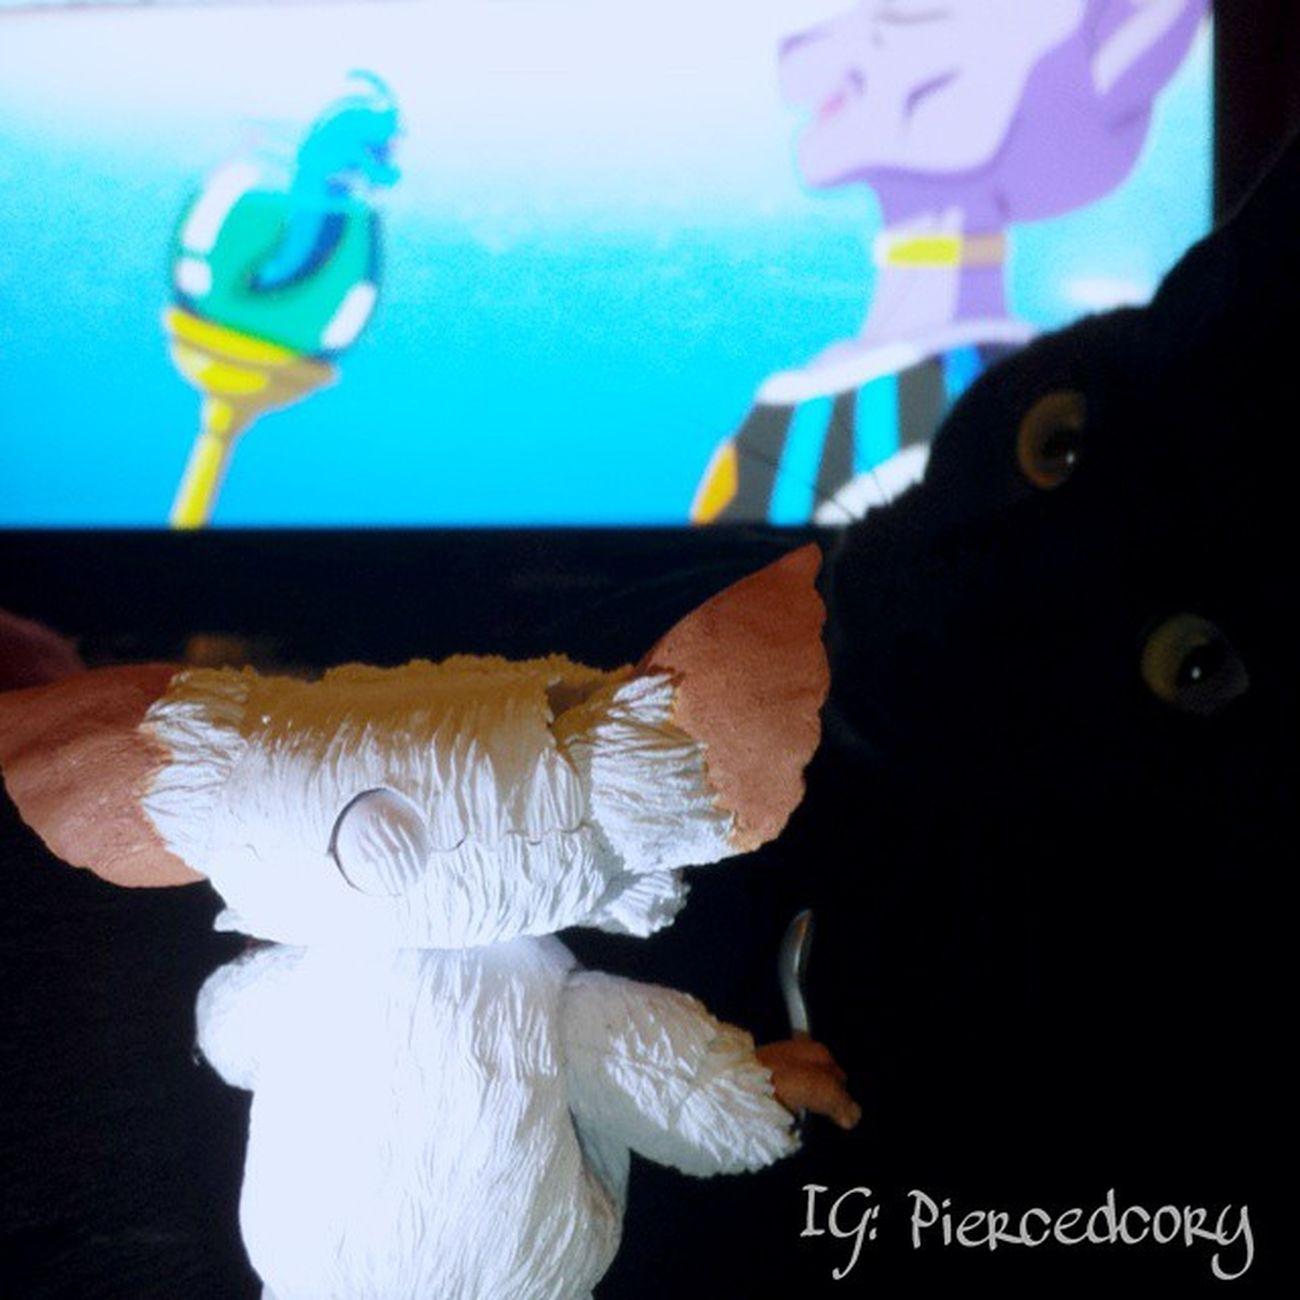 Dammit Gary! Cats are friends not food! Now just watch the movie. My1anubis FunWithMogwaiGary Instacat Dragonballzbattleofgods DBZ Rescue BLackCat